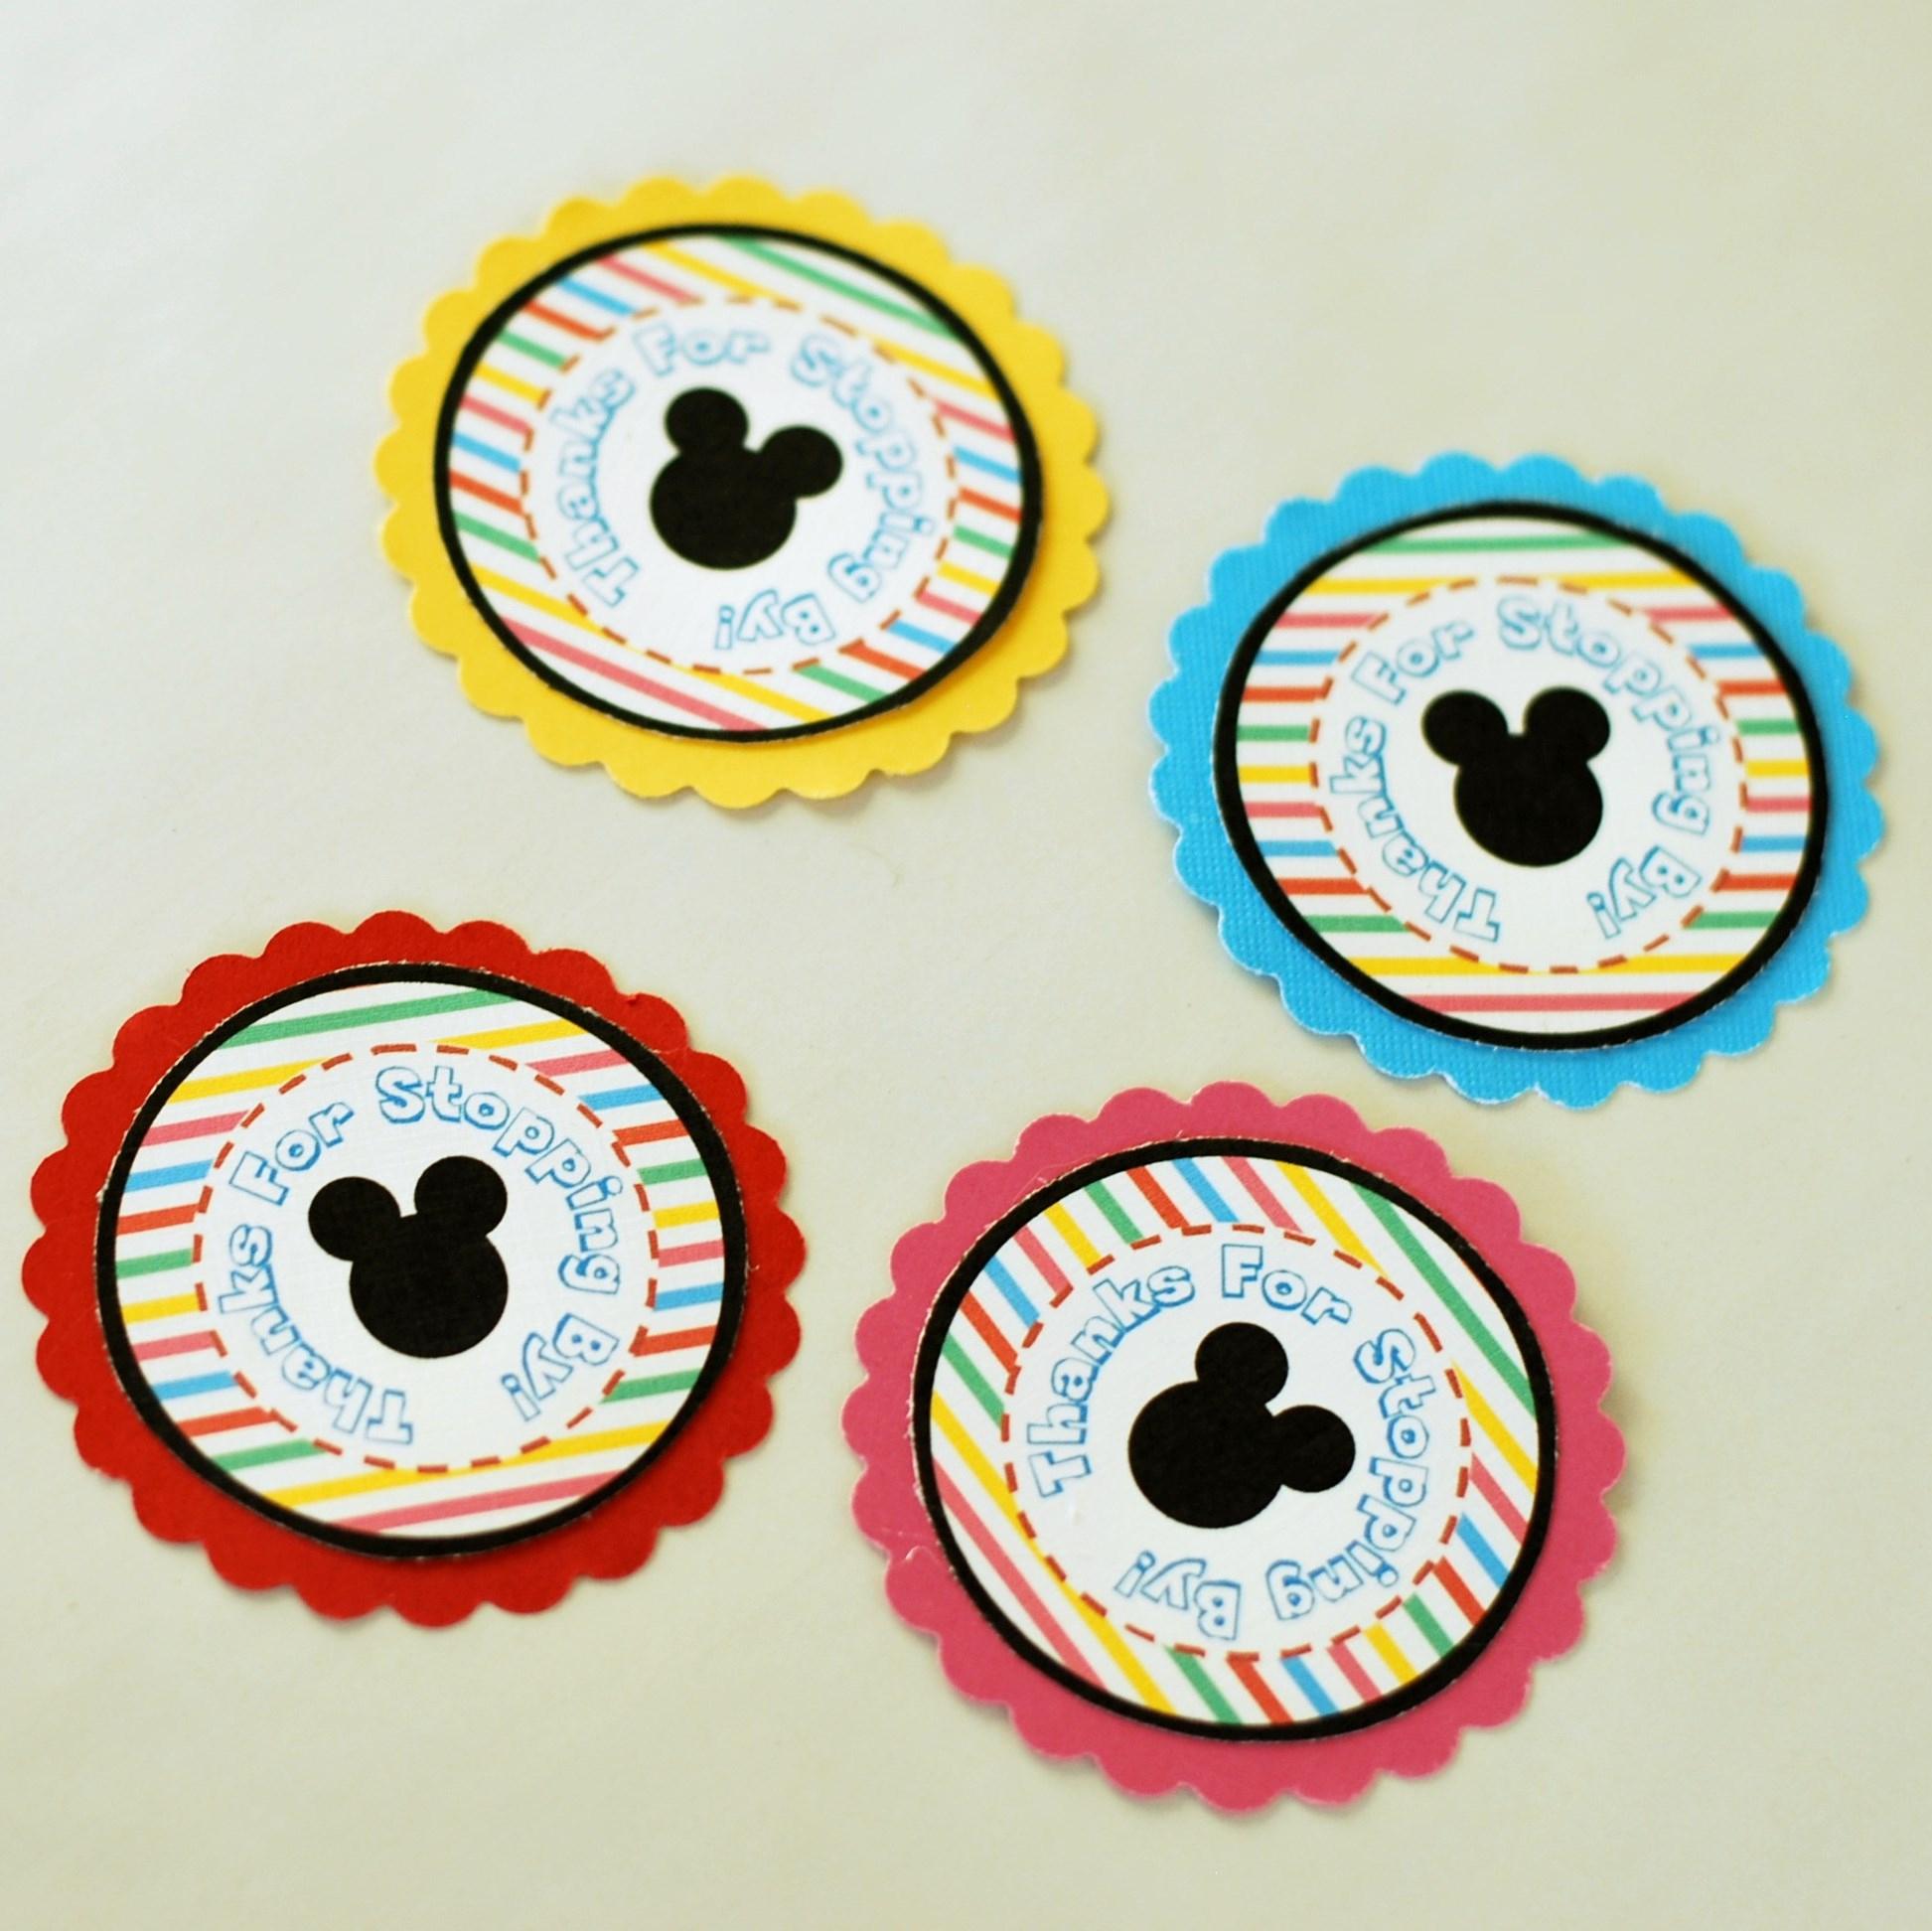 Free Party Printables | Posh Tart - Free Printable Mickey Mouse Favor Tags